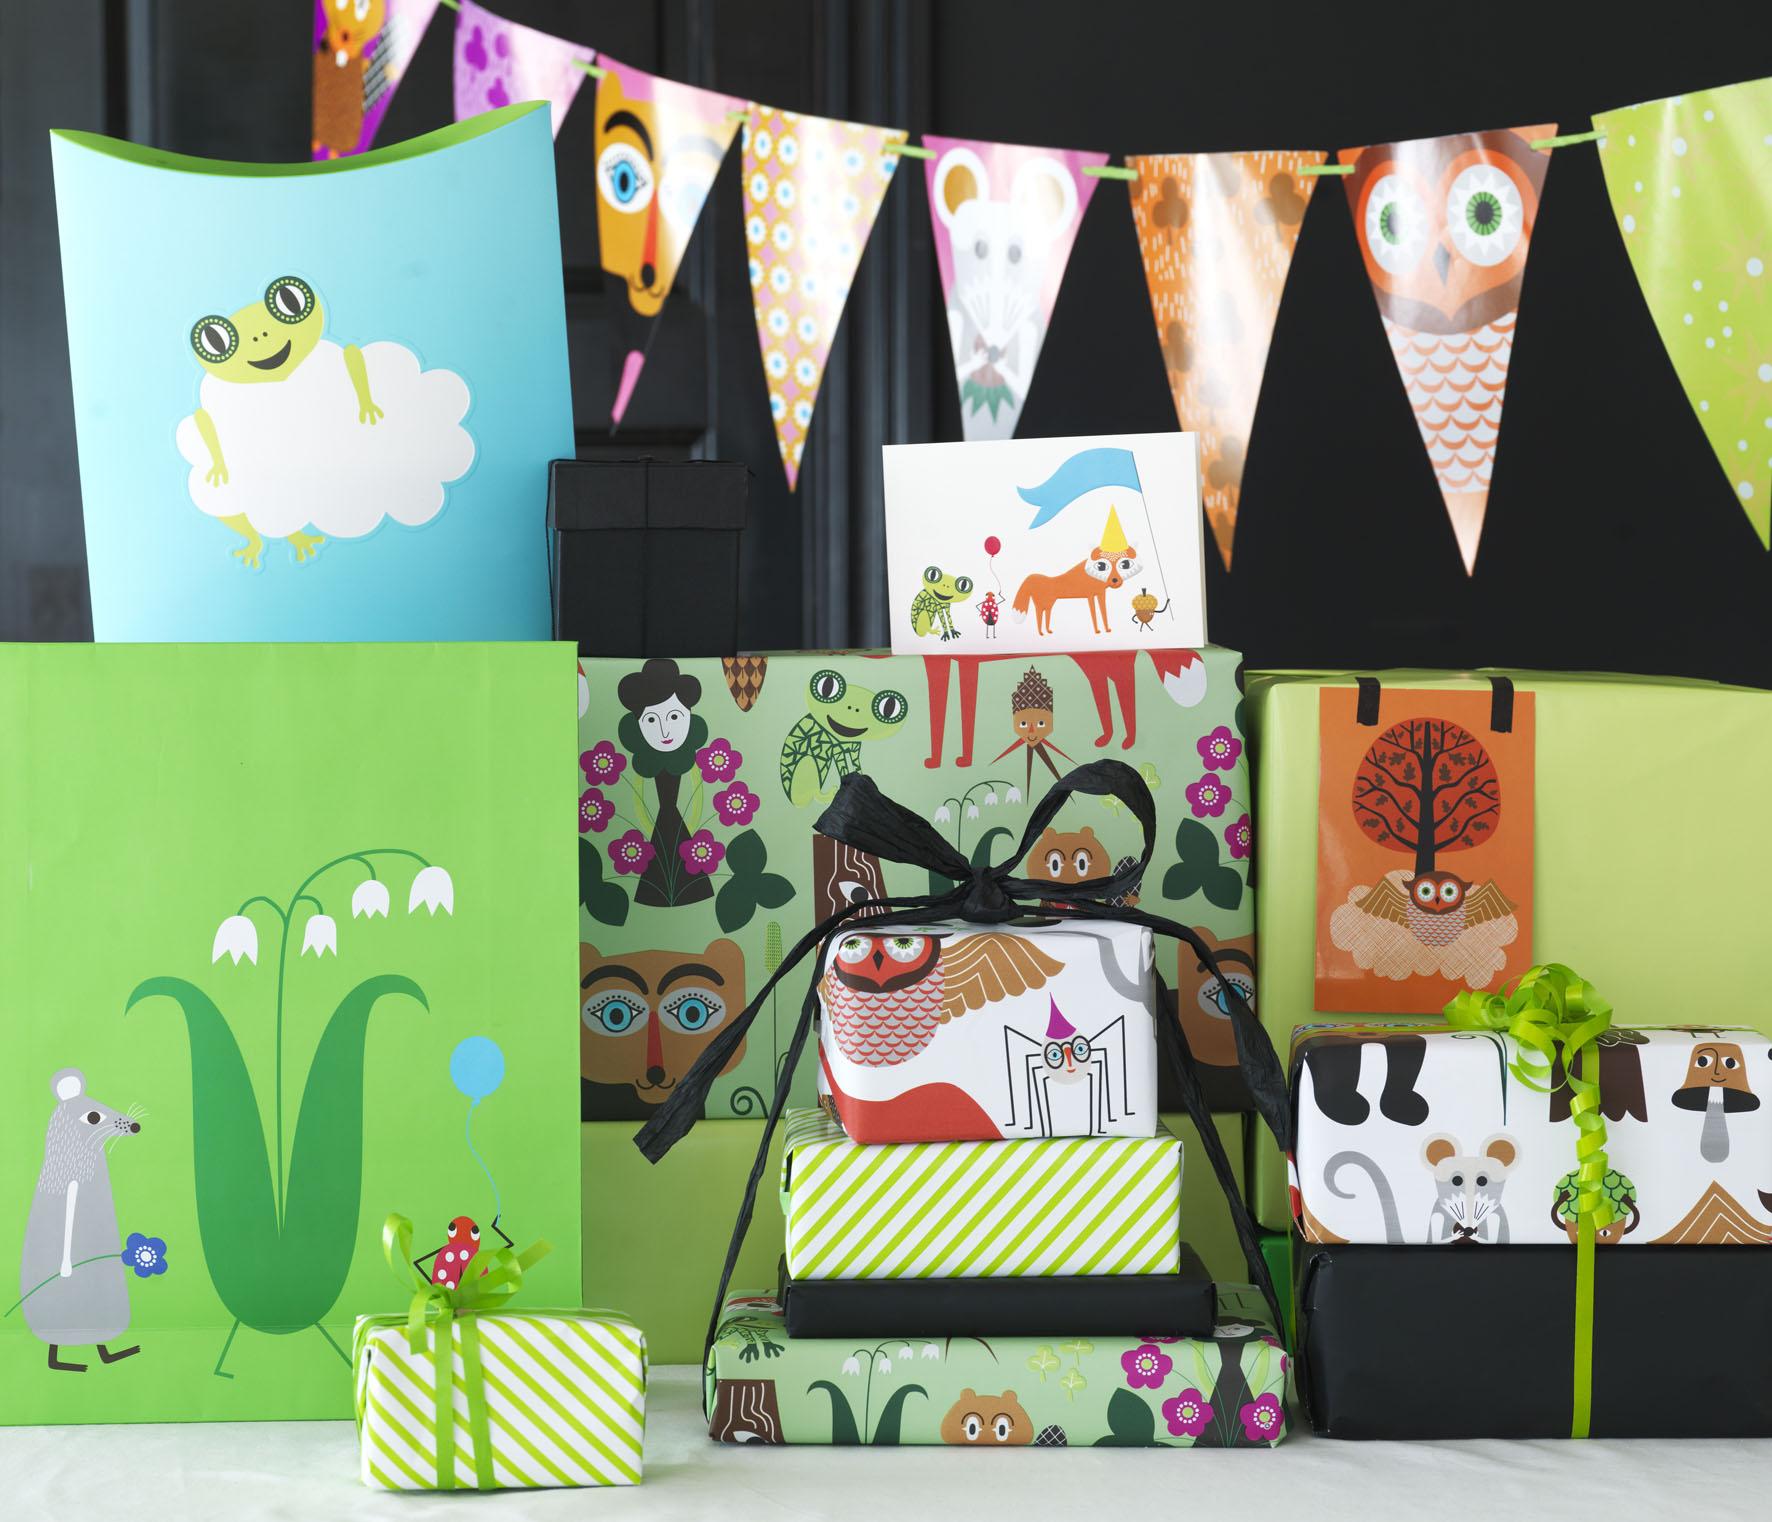 lifestyle ikea cadeau collectie voor kinderen stijlvol mama lifestyle blog. Black Bedroom Furniture Sets. Home Design Ideas